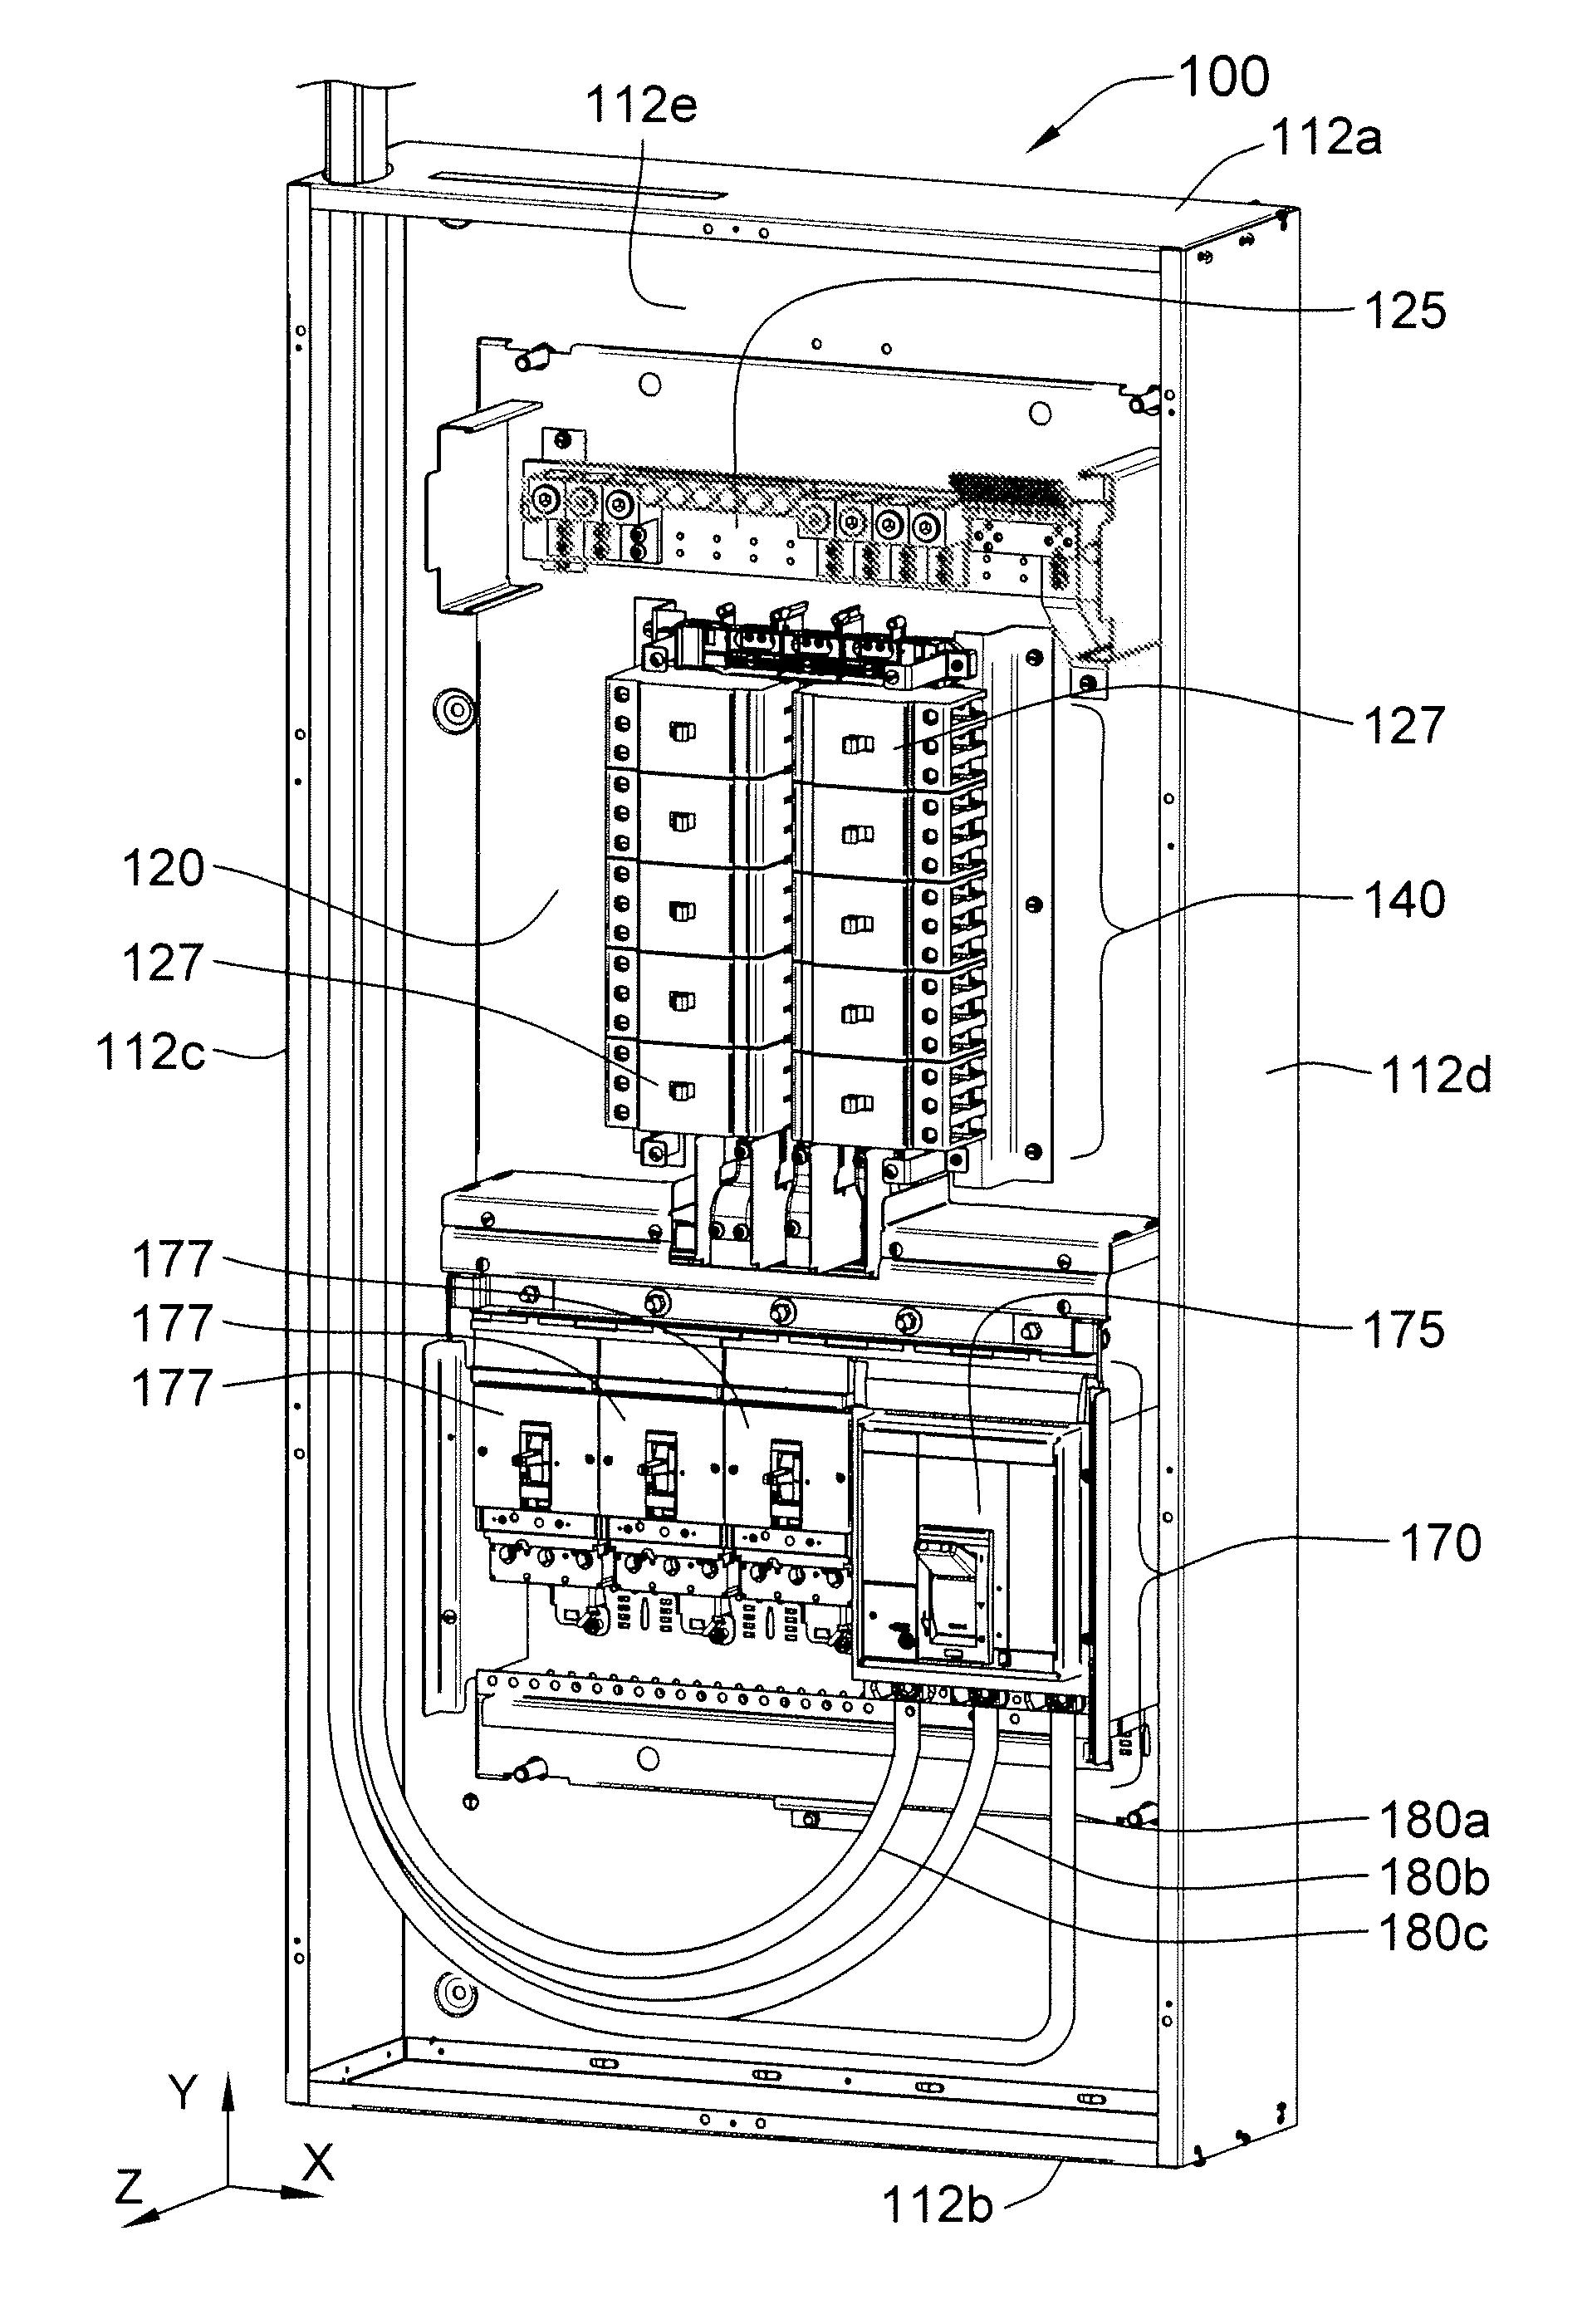 Patent Us8305739 High Density Power Lighting Panelboard